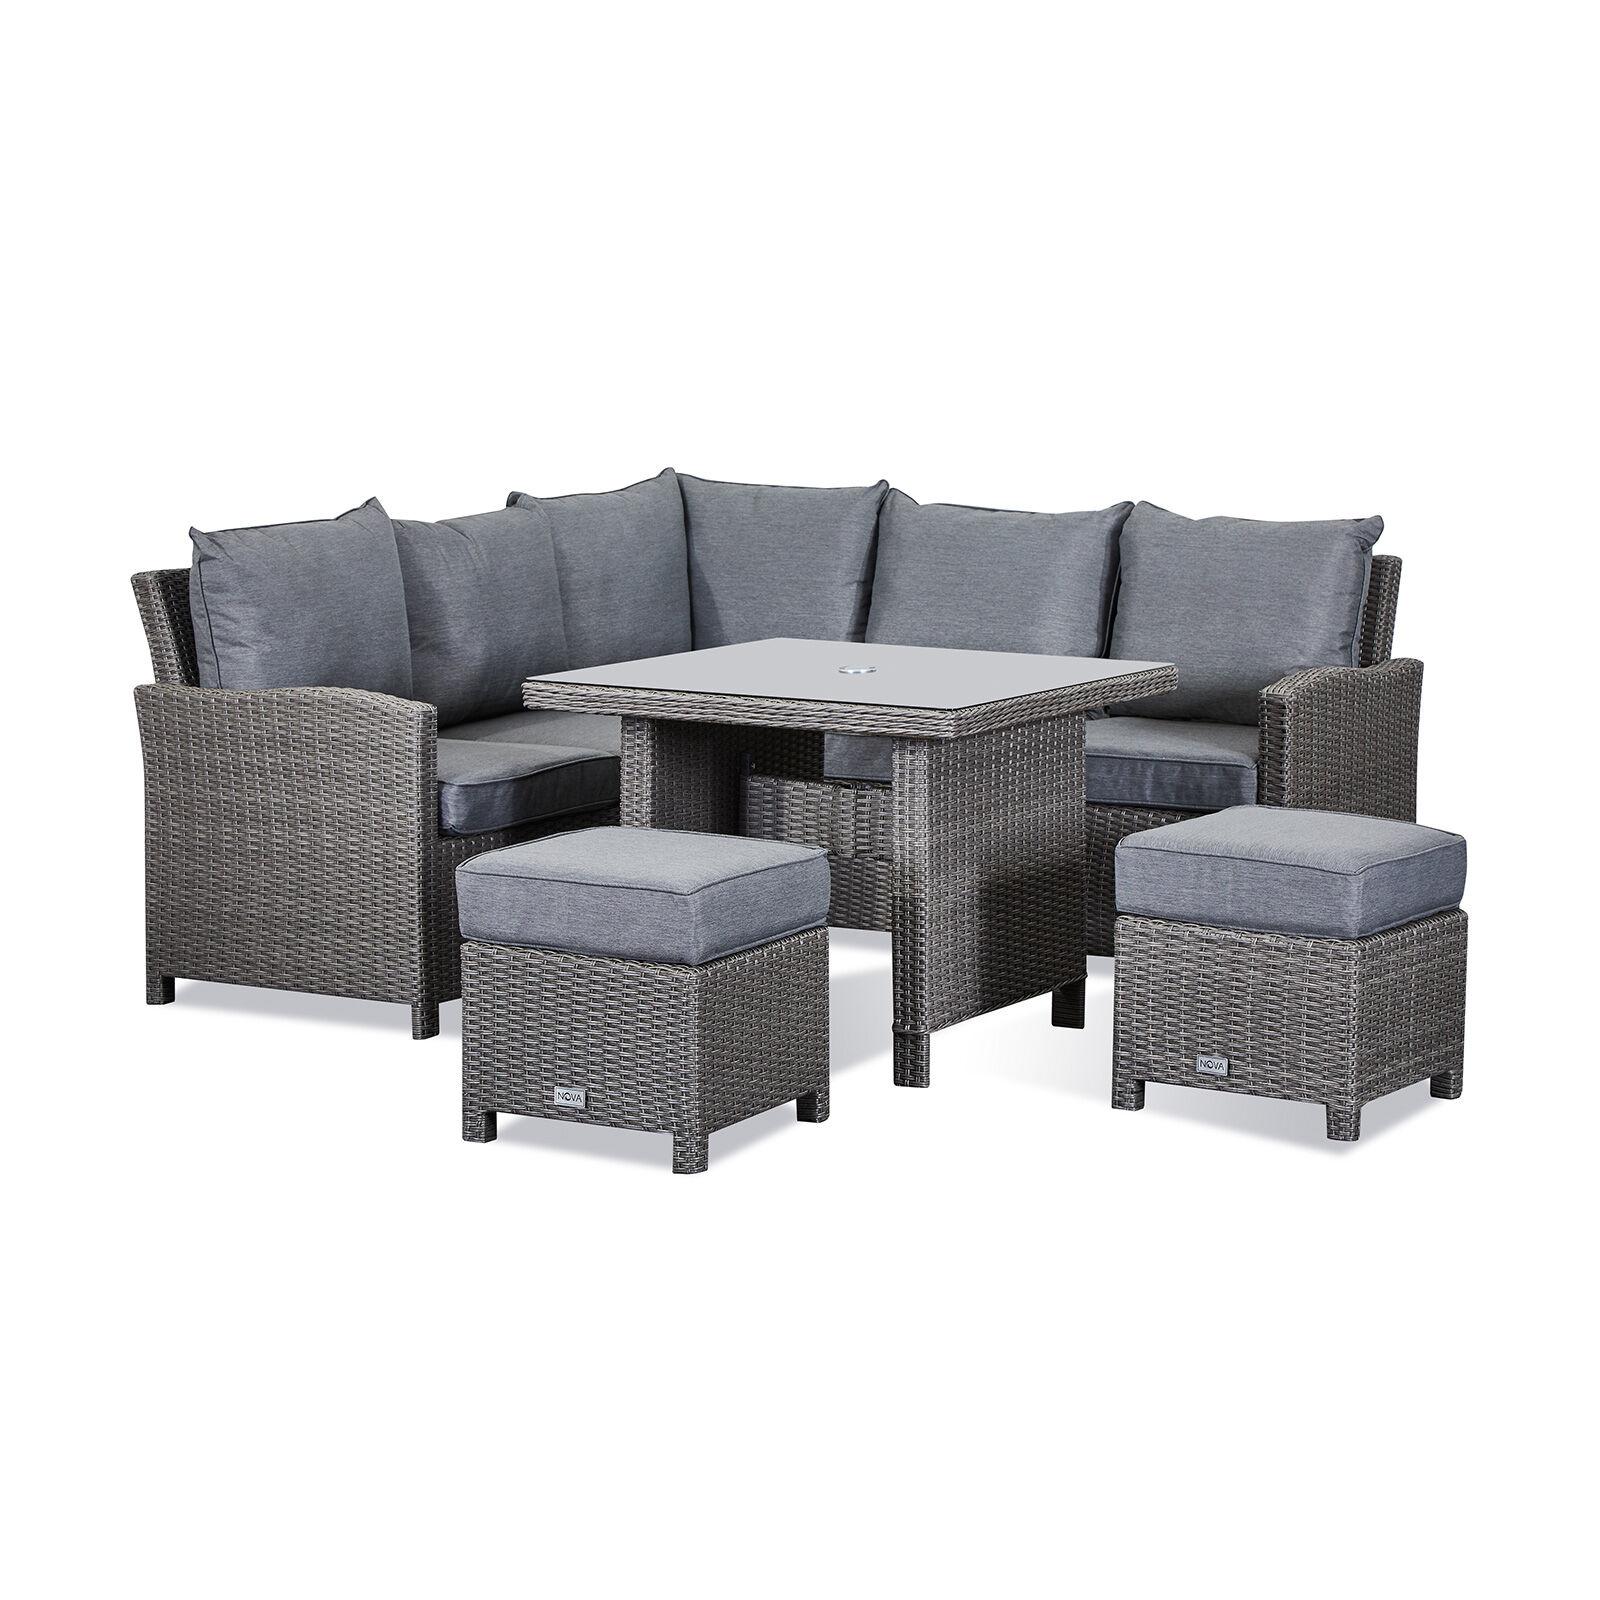 Oakworld Alfresco Heritage Ciara Compact Corner Dining Set with Casual Parasol Hole Table   Slate Grey